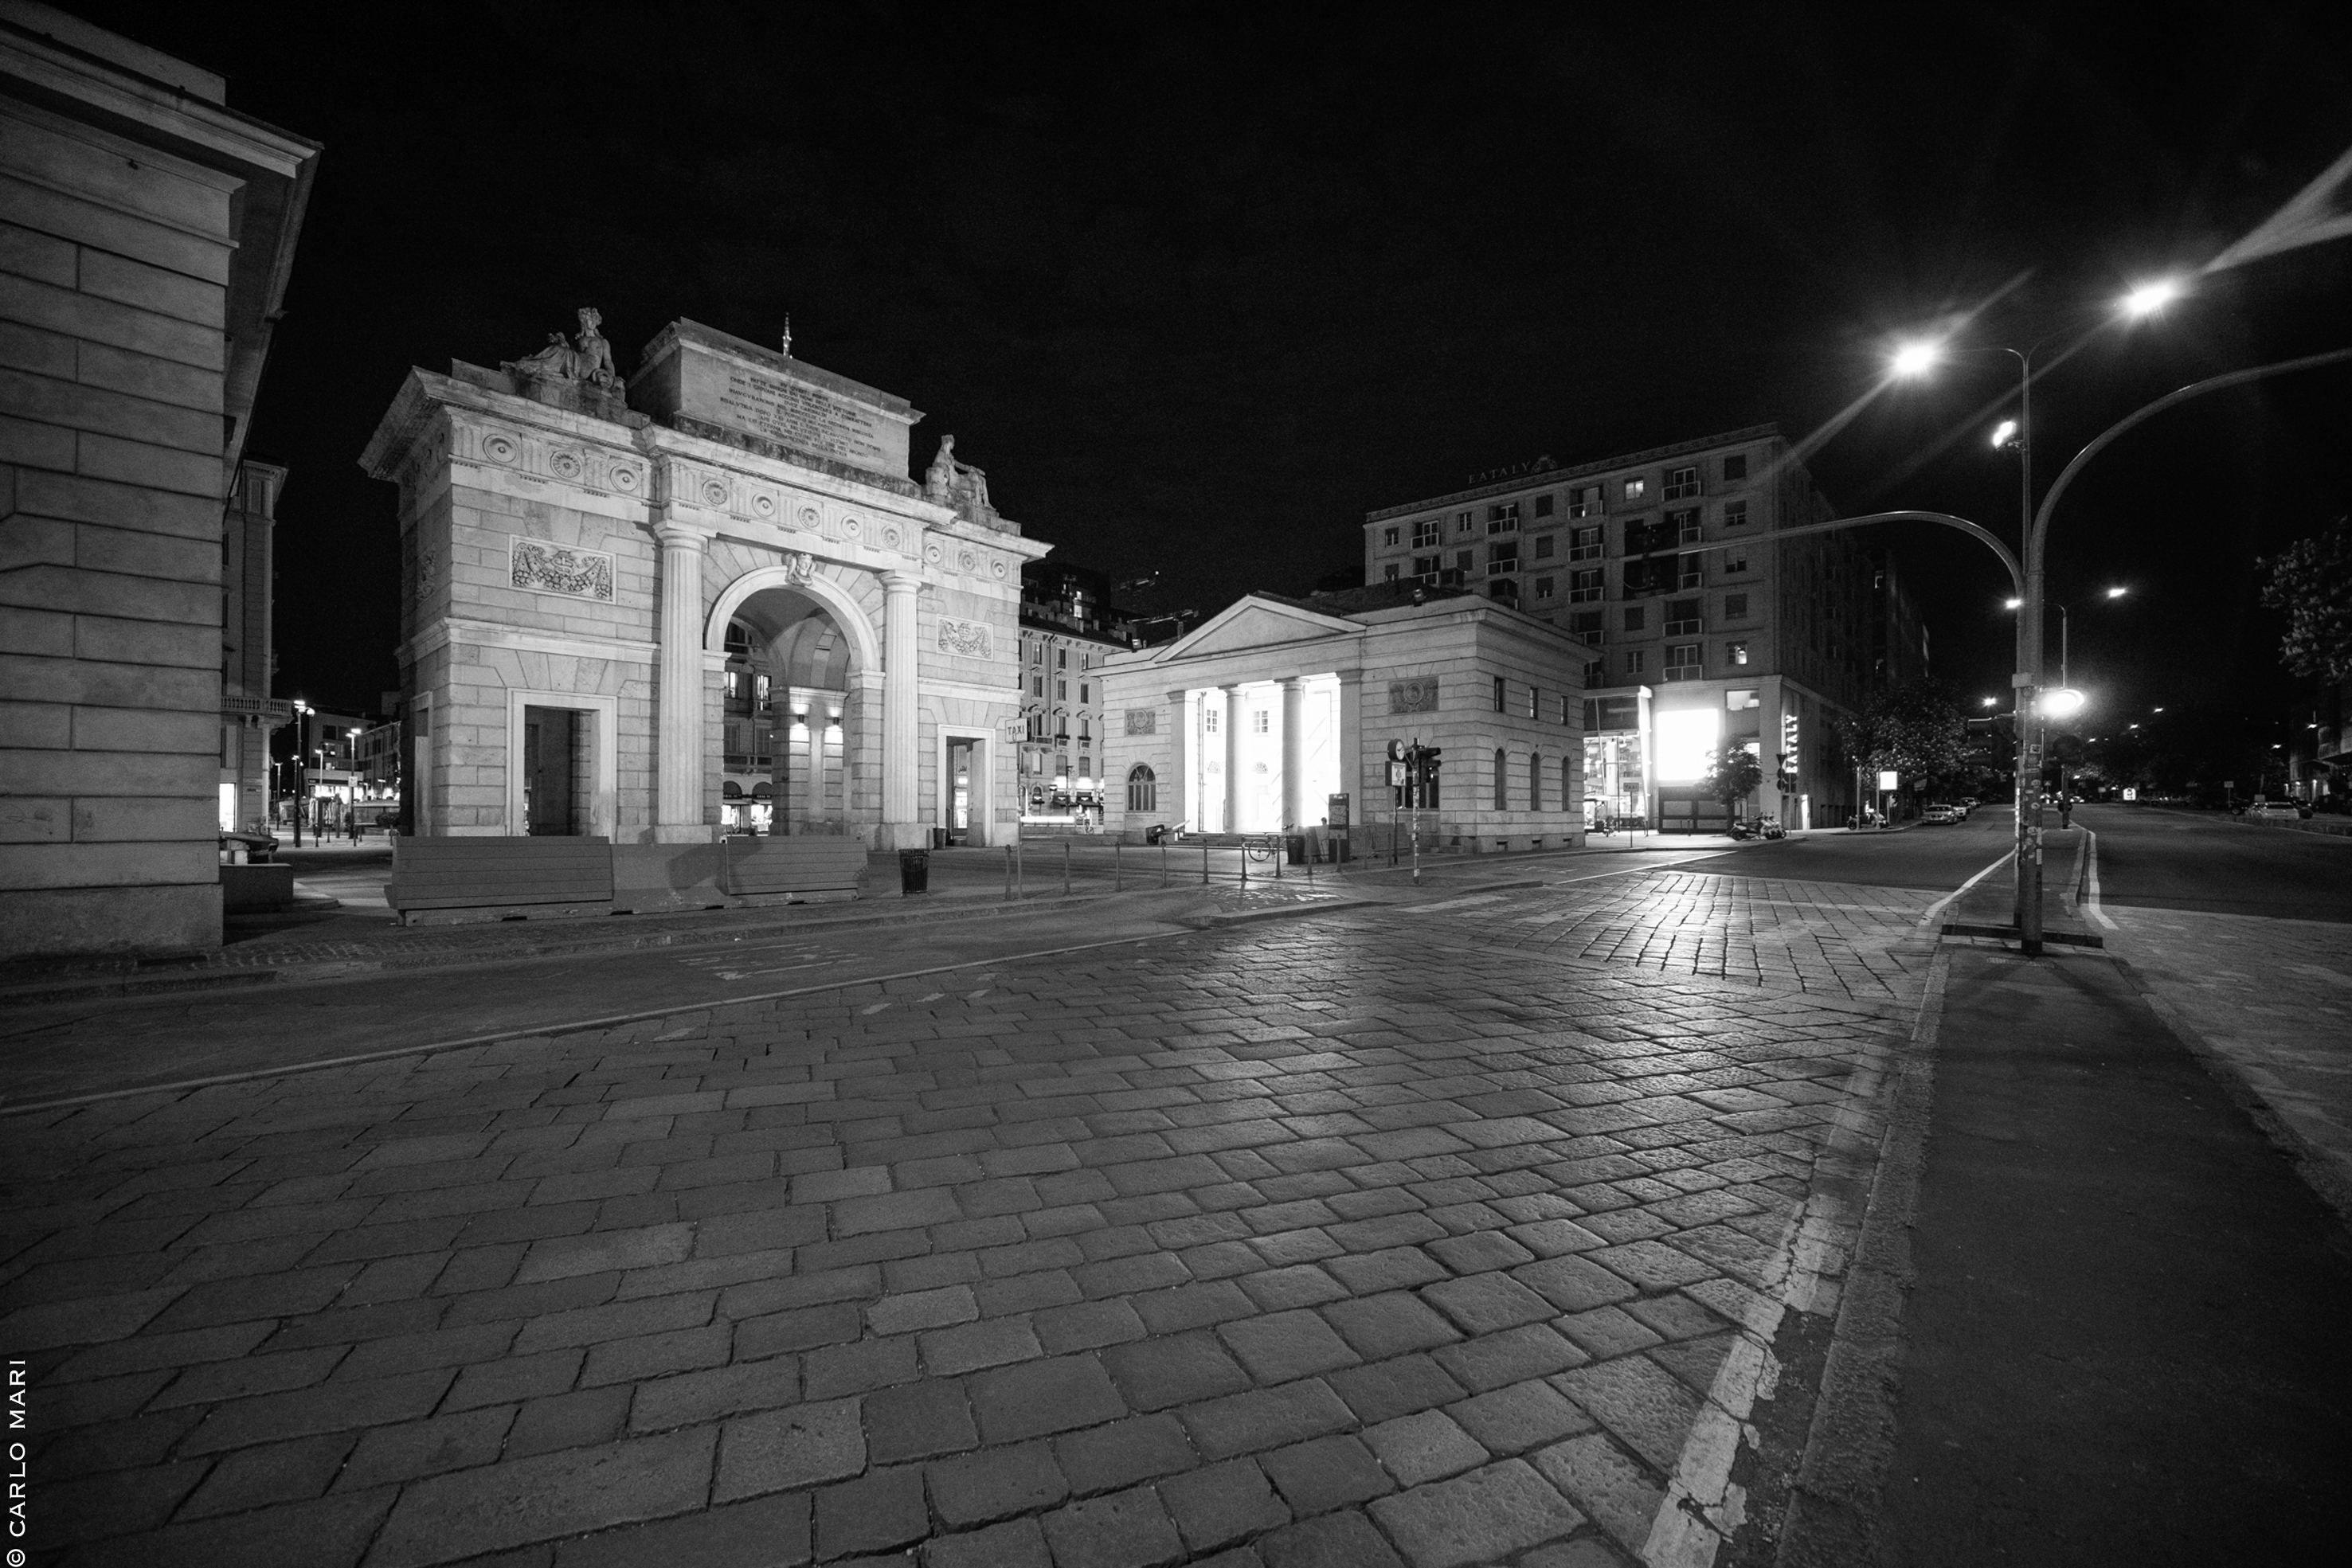 Piazza XXV Aprile